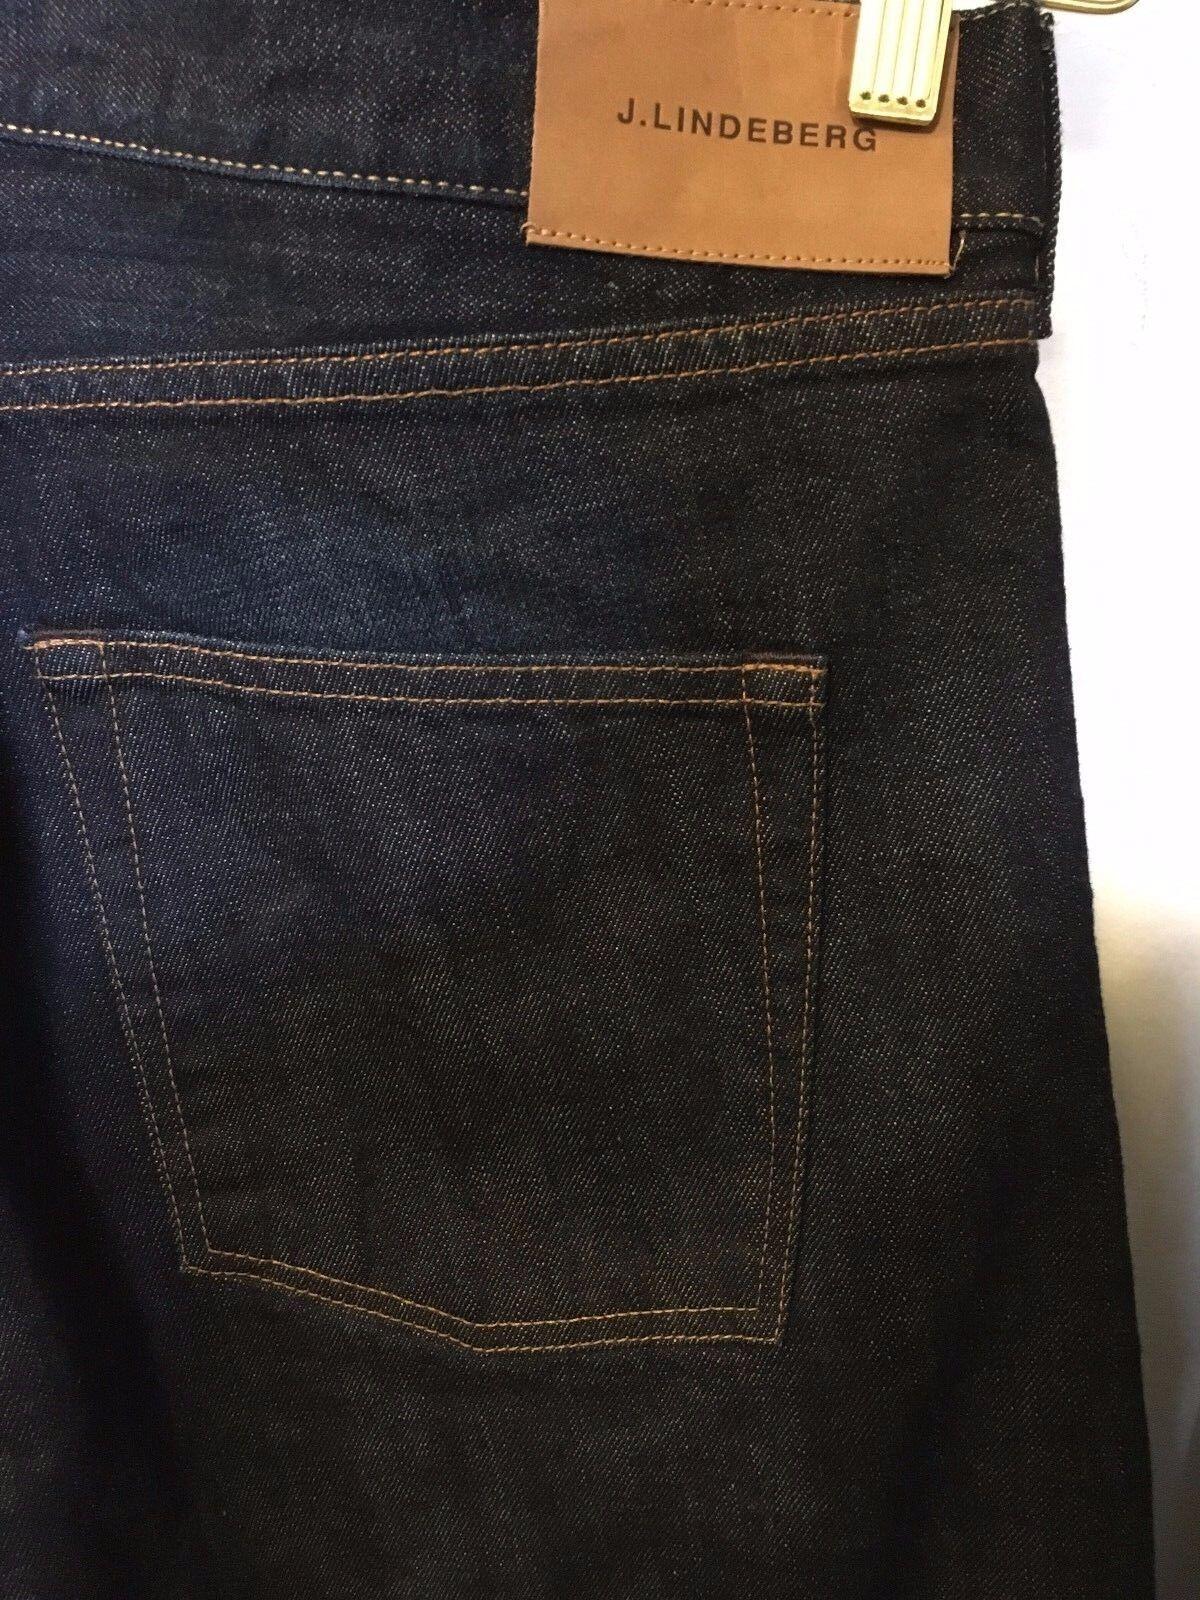 J. Lindeberg men's jeans rinse dark bluee straight Slim fit denim size 38